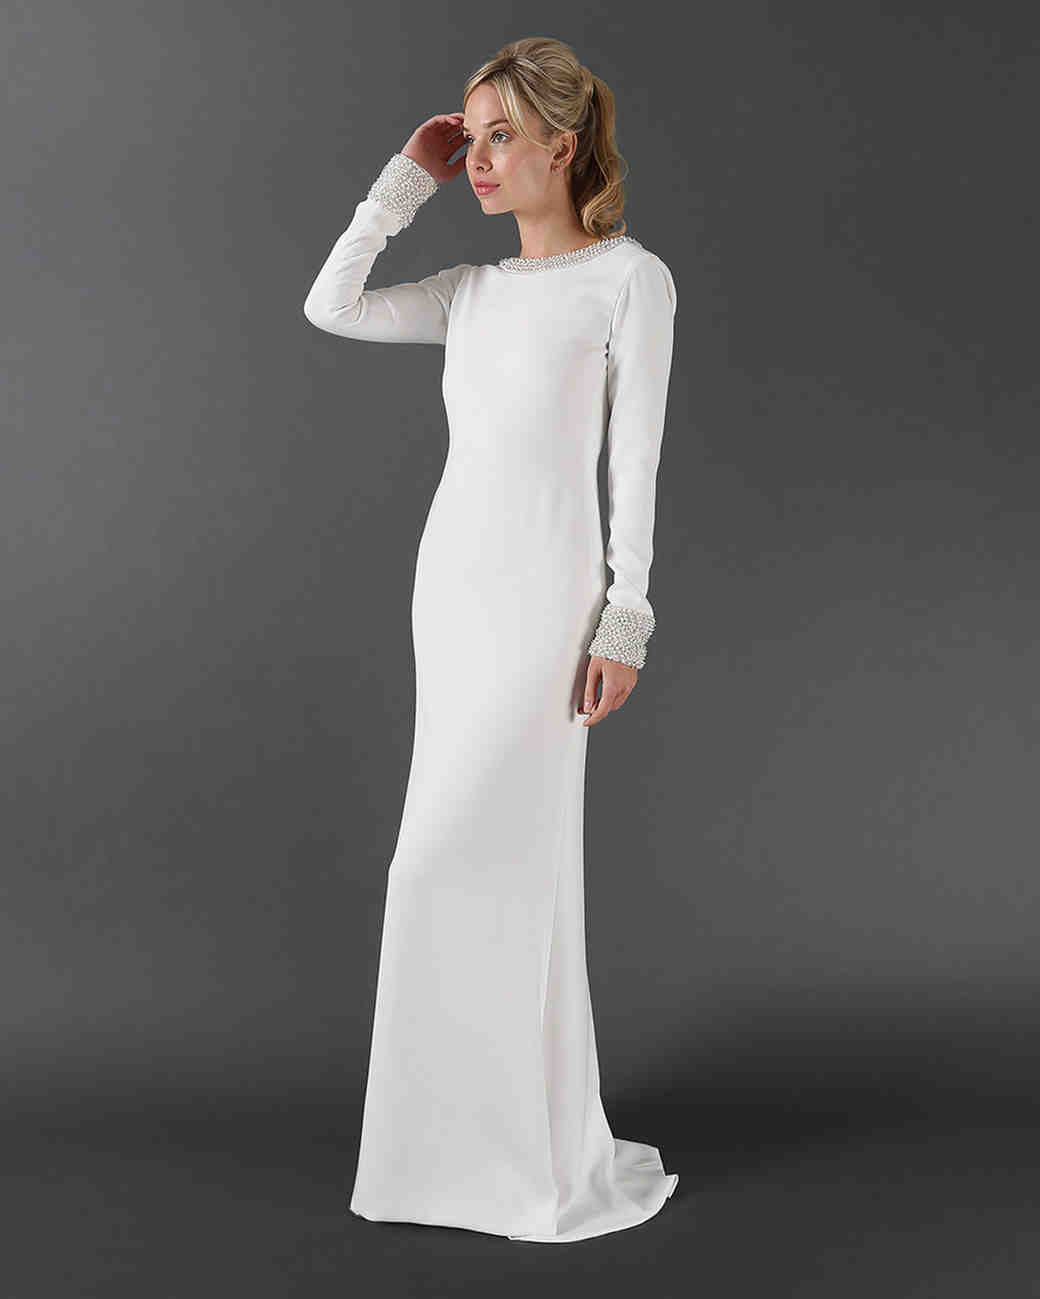 long sleeved wedding dresses wedding dress long sleeve